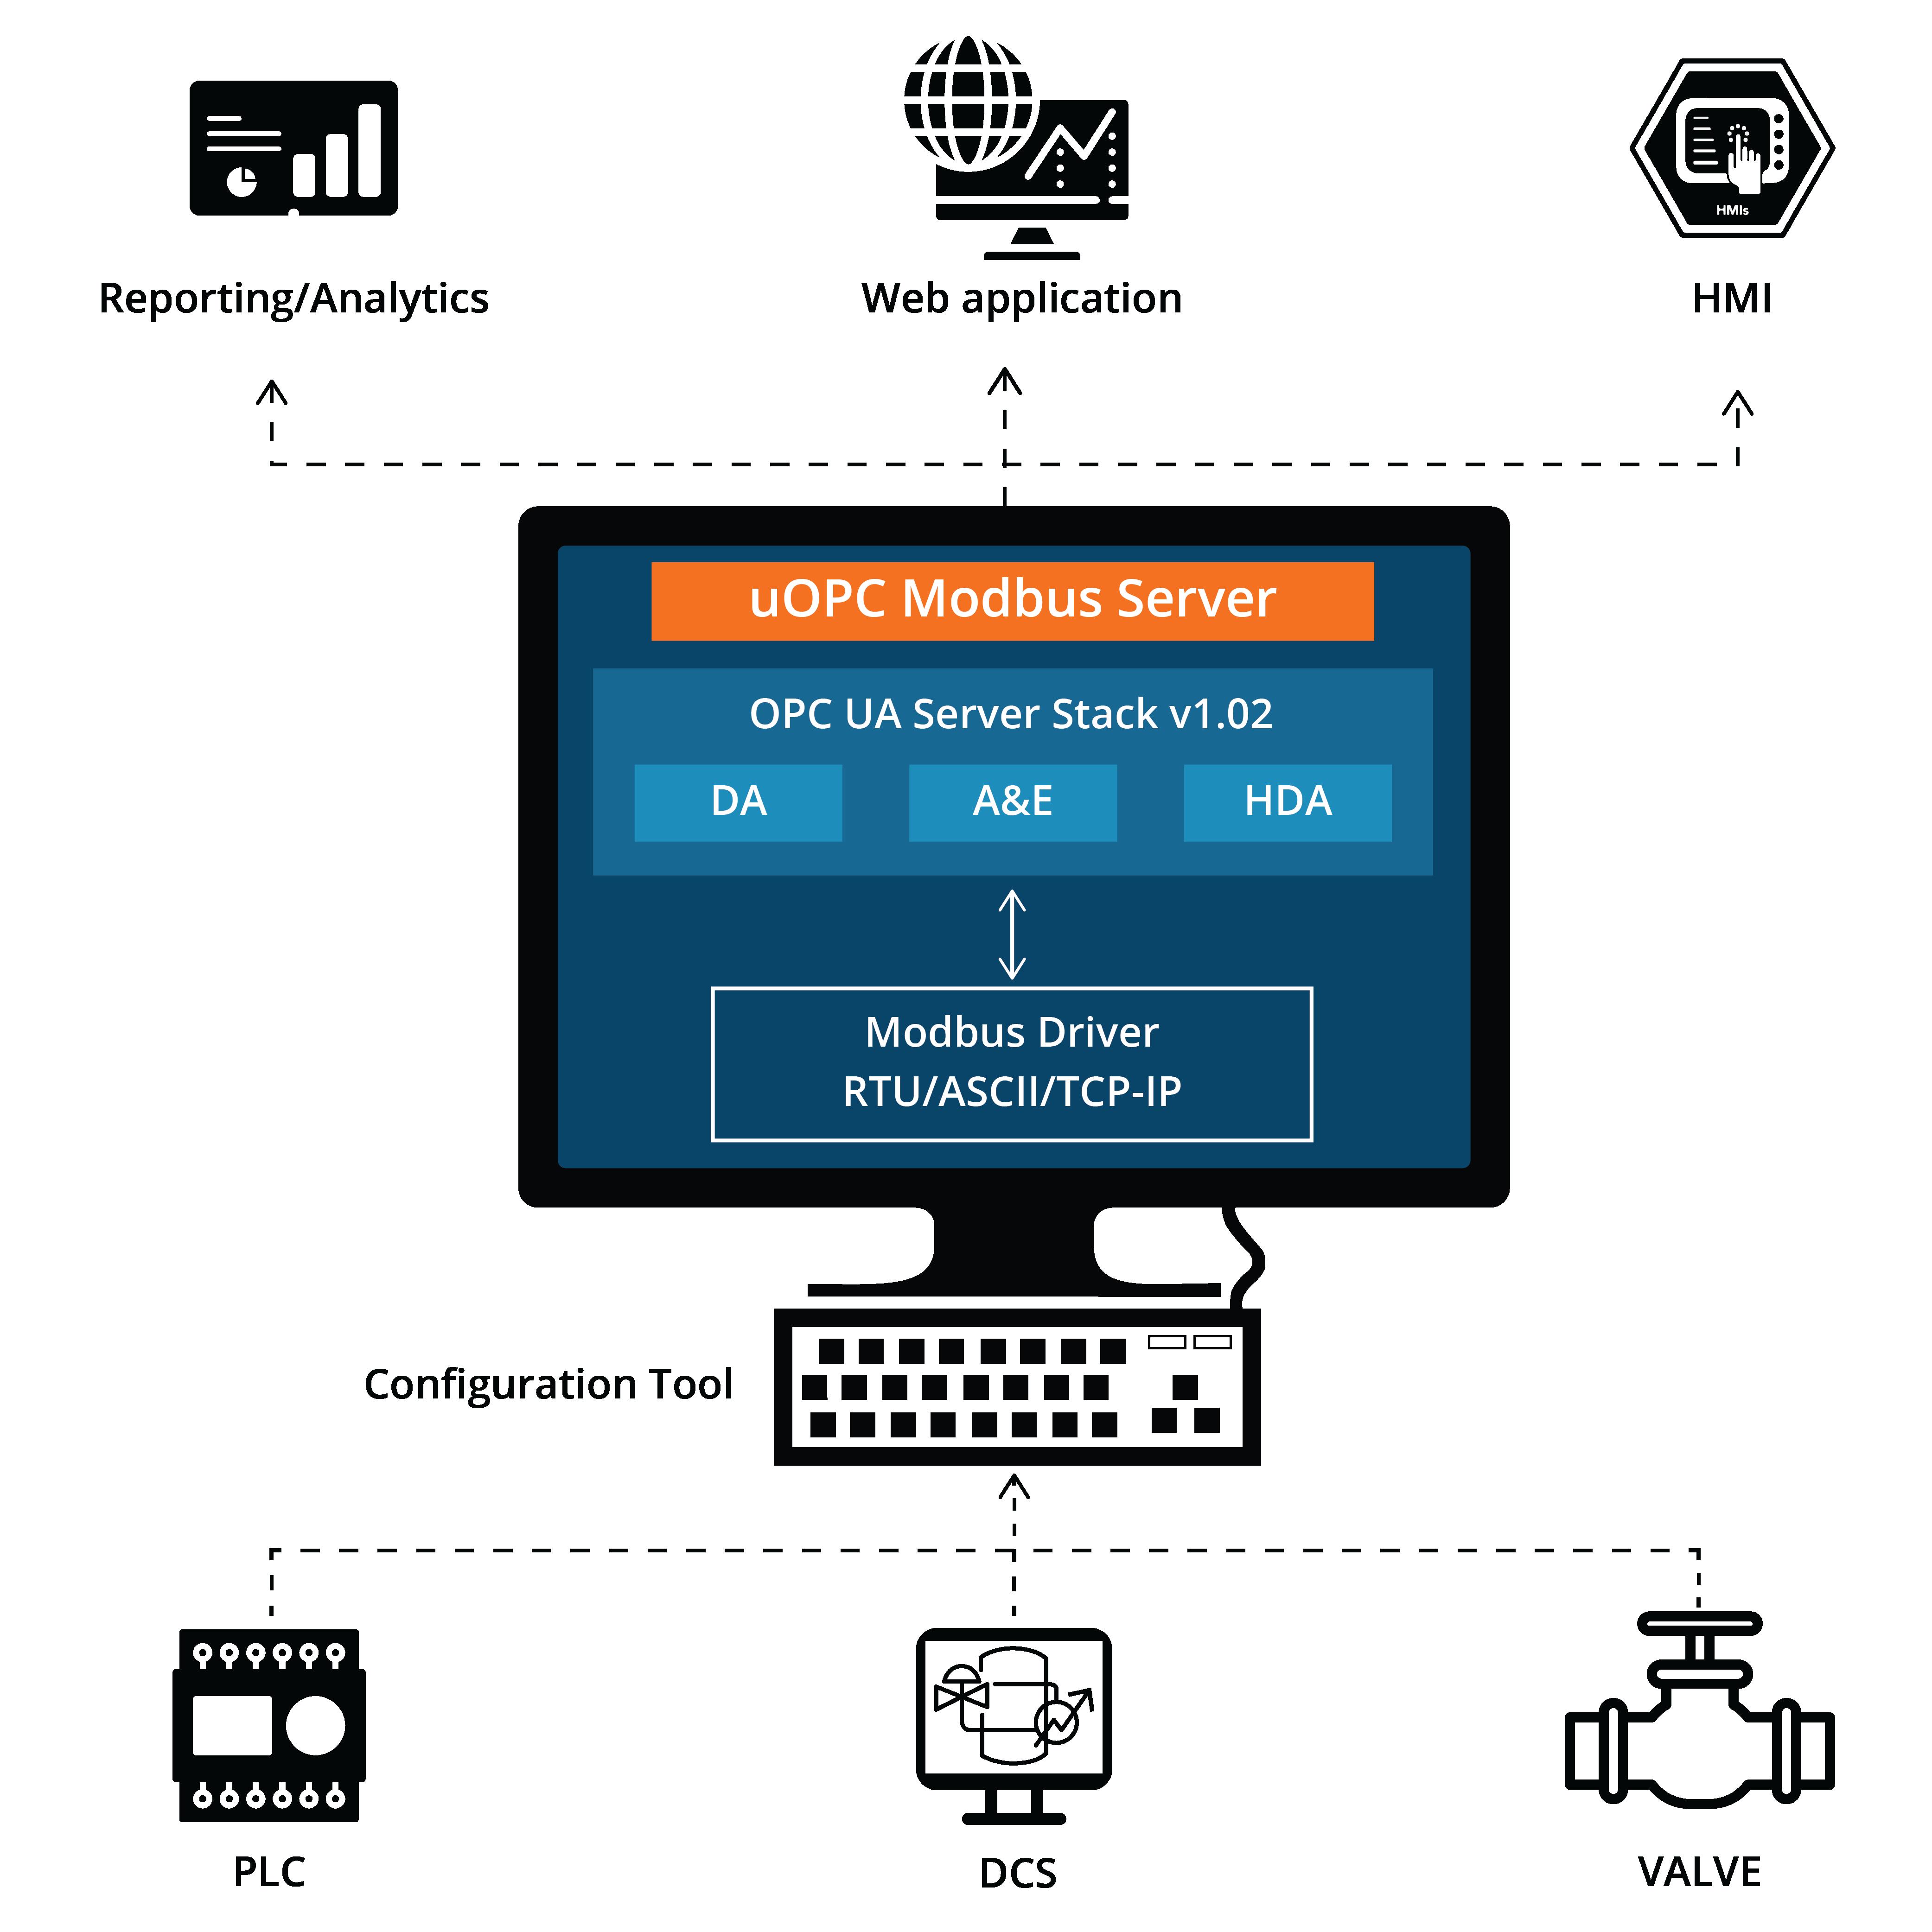 uOPC Modbus Server